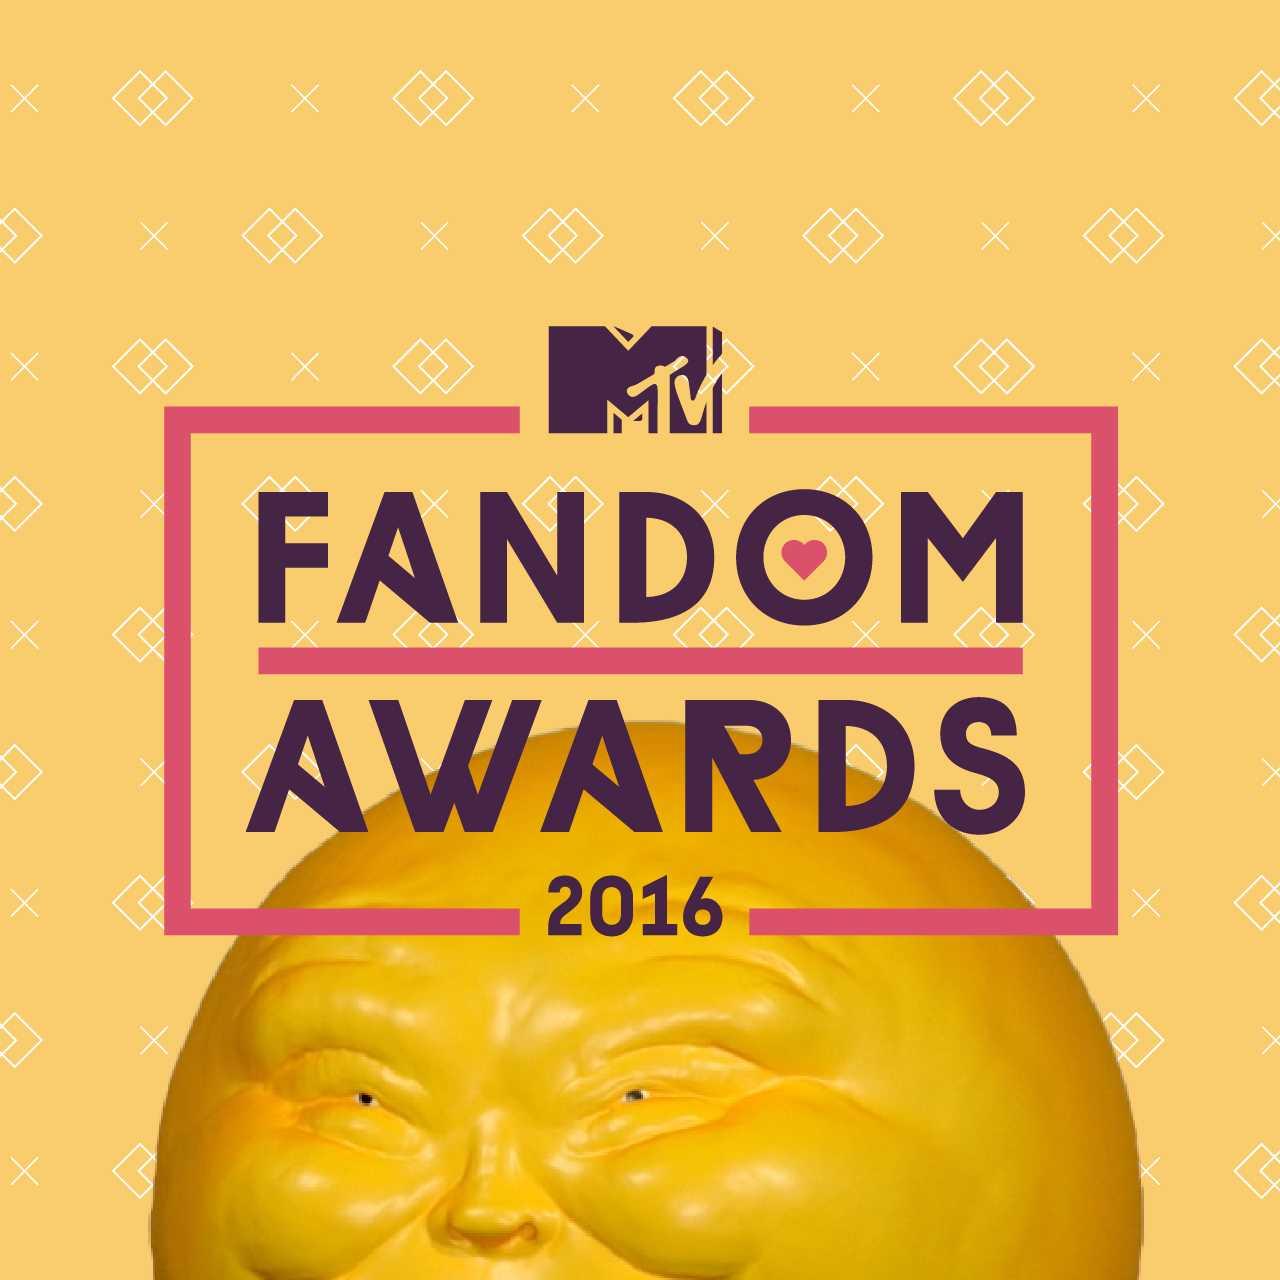 MTV Announces Nominees For 3rd Annual Fandom Awards | fandom awards